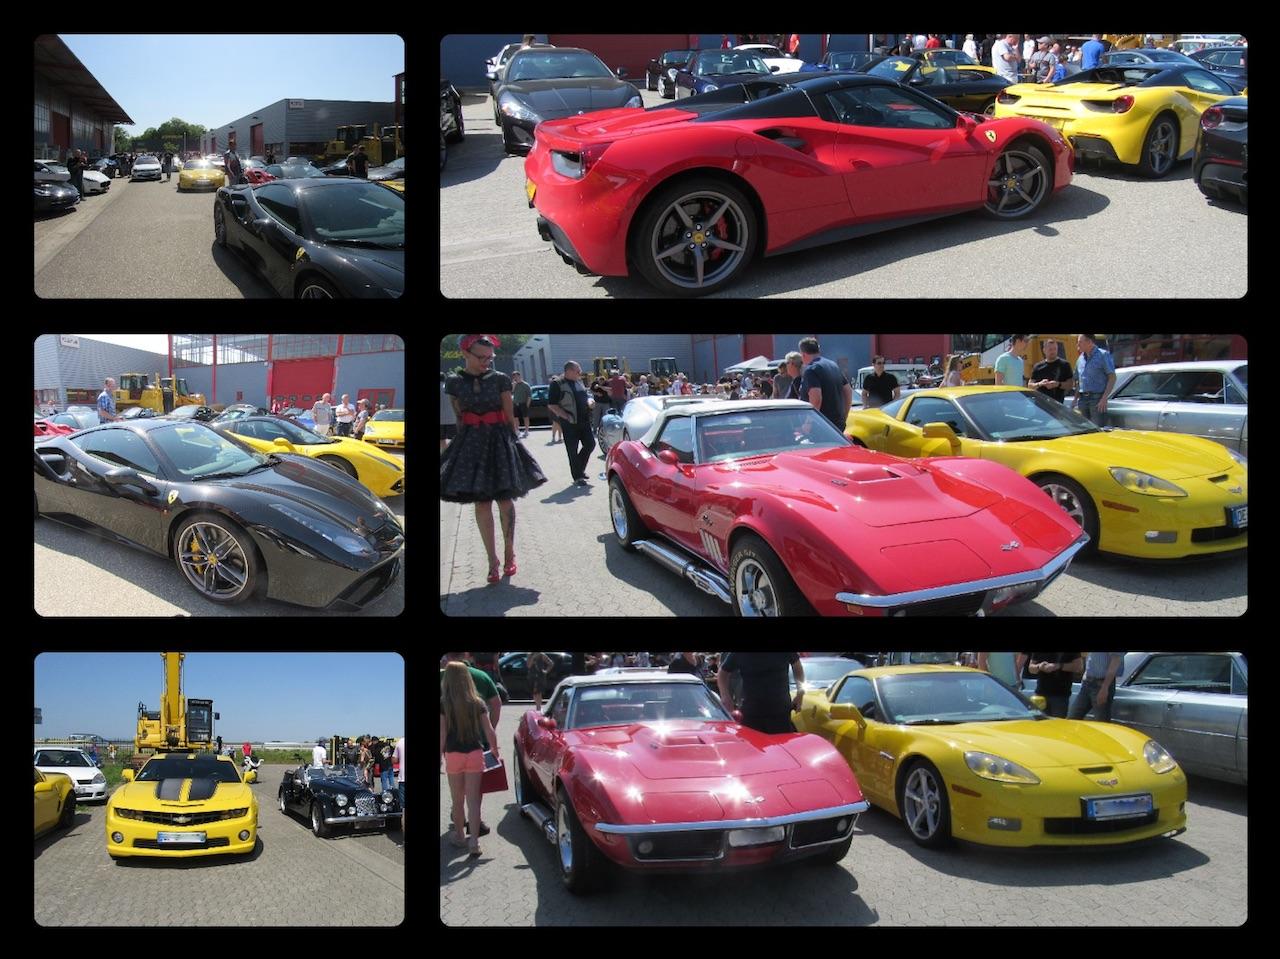 Corvette club performancemotors 4